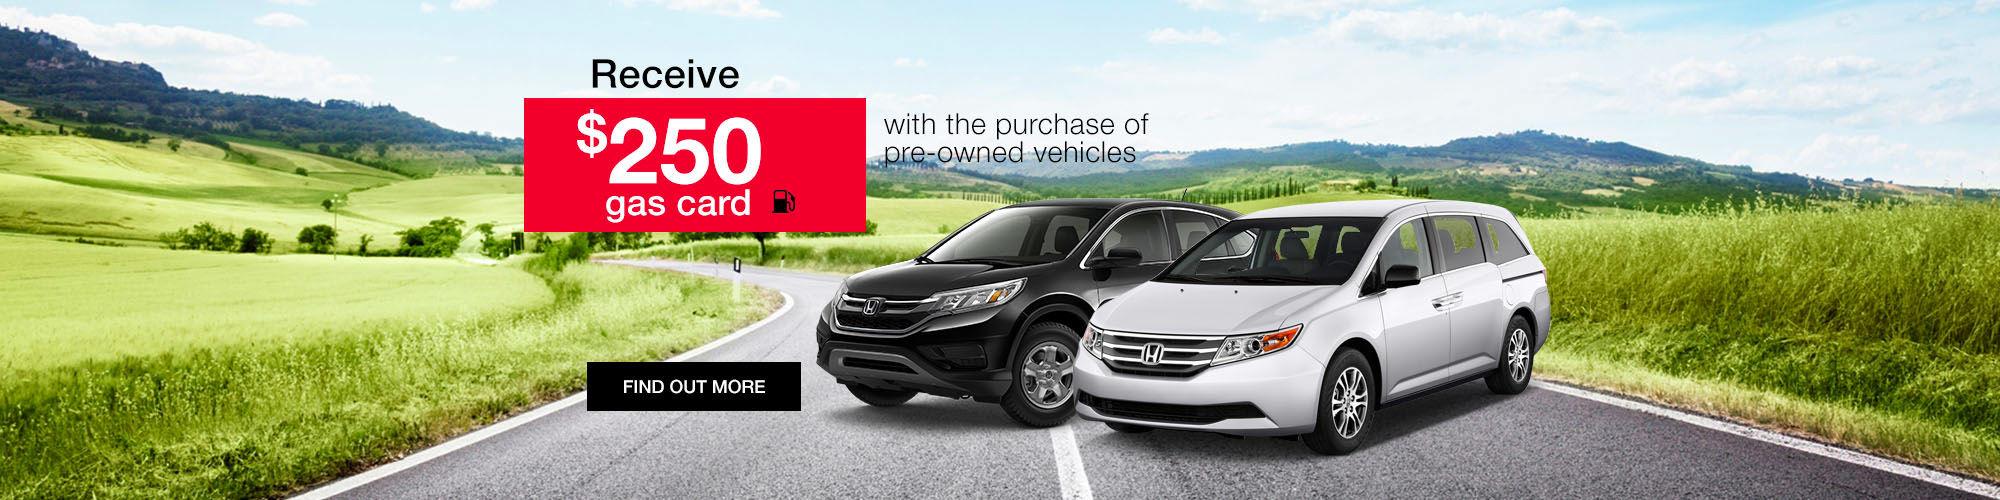 Honda $250 Gas Card